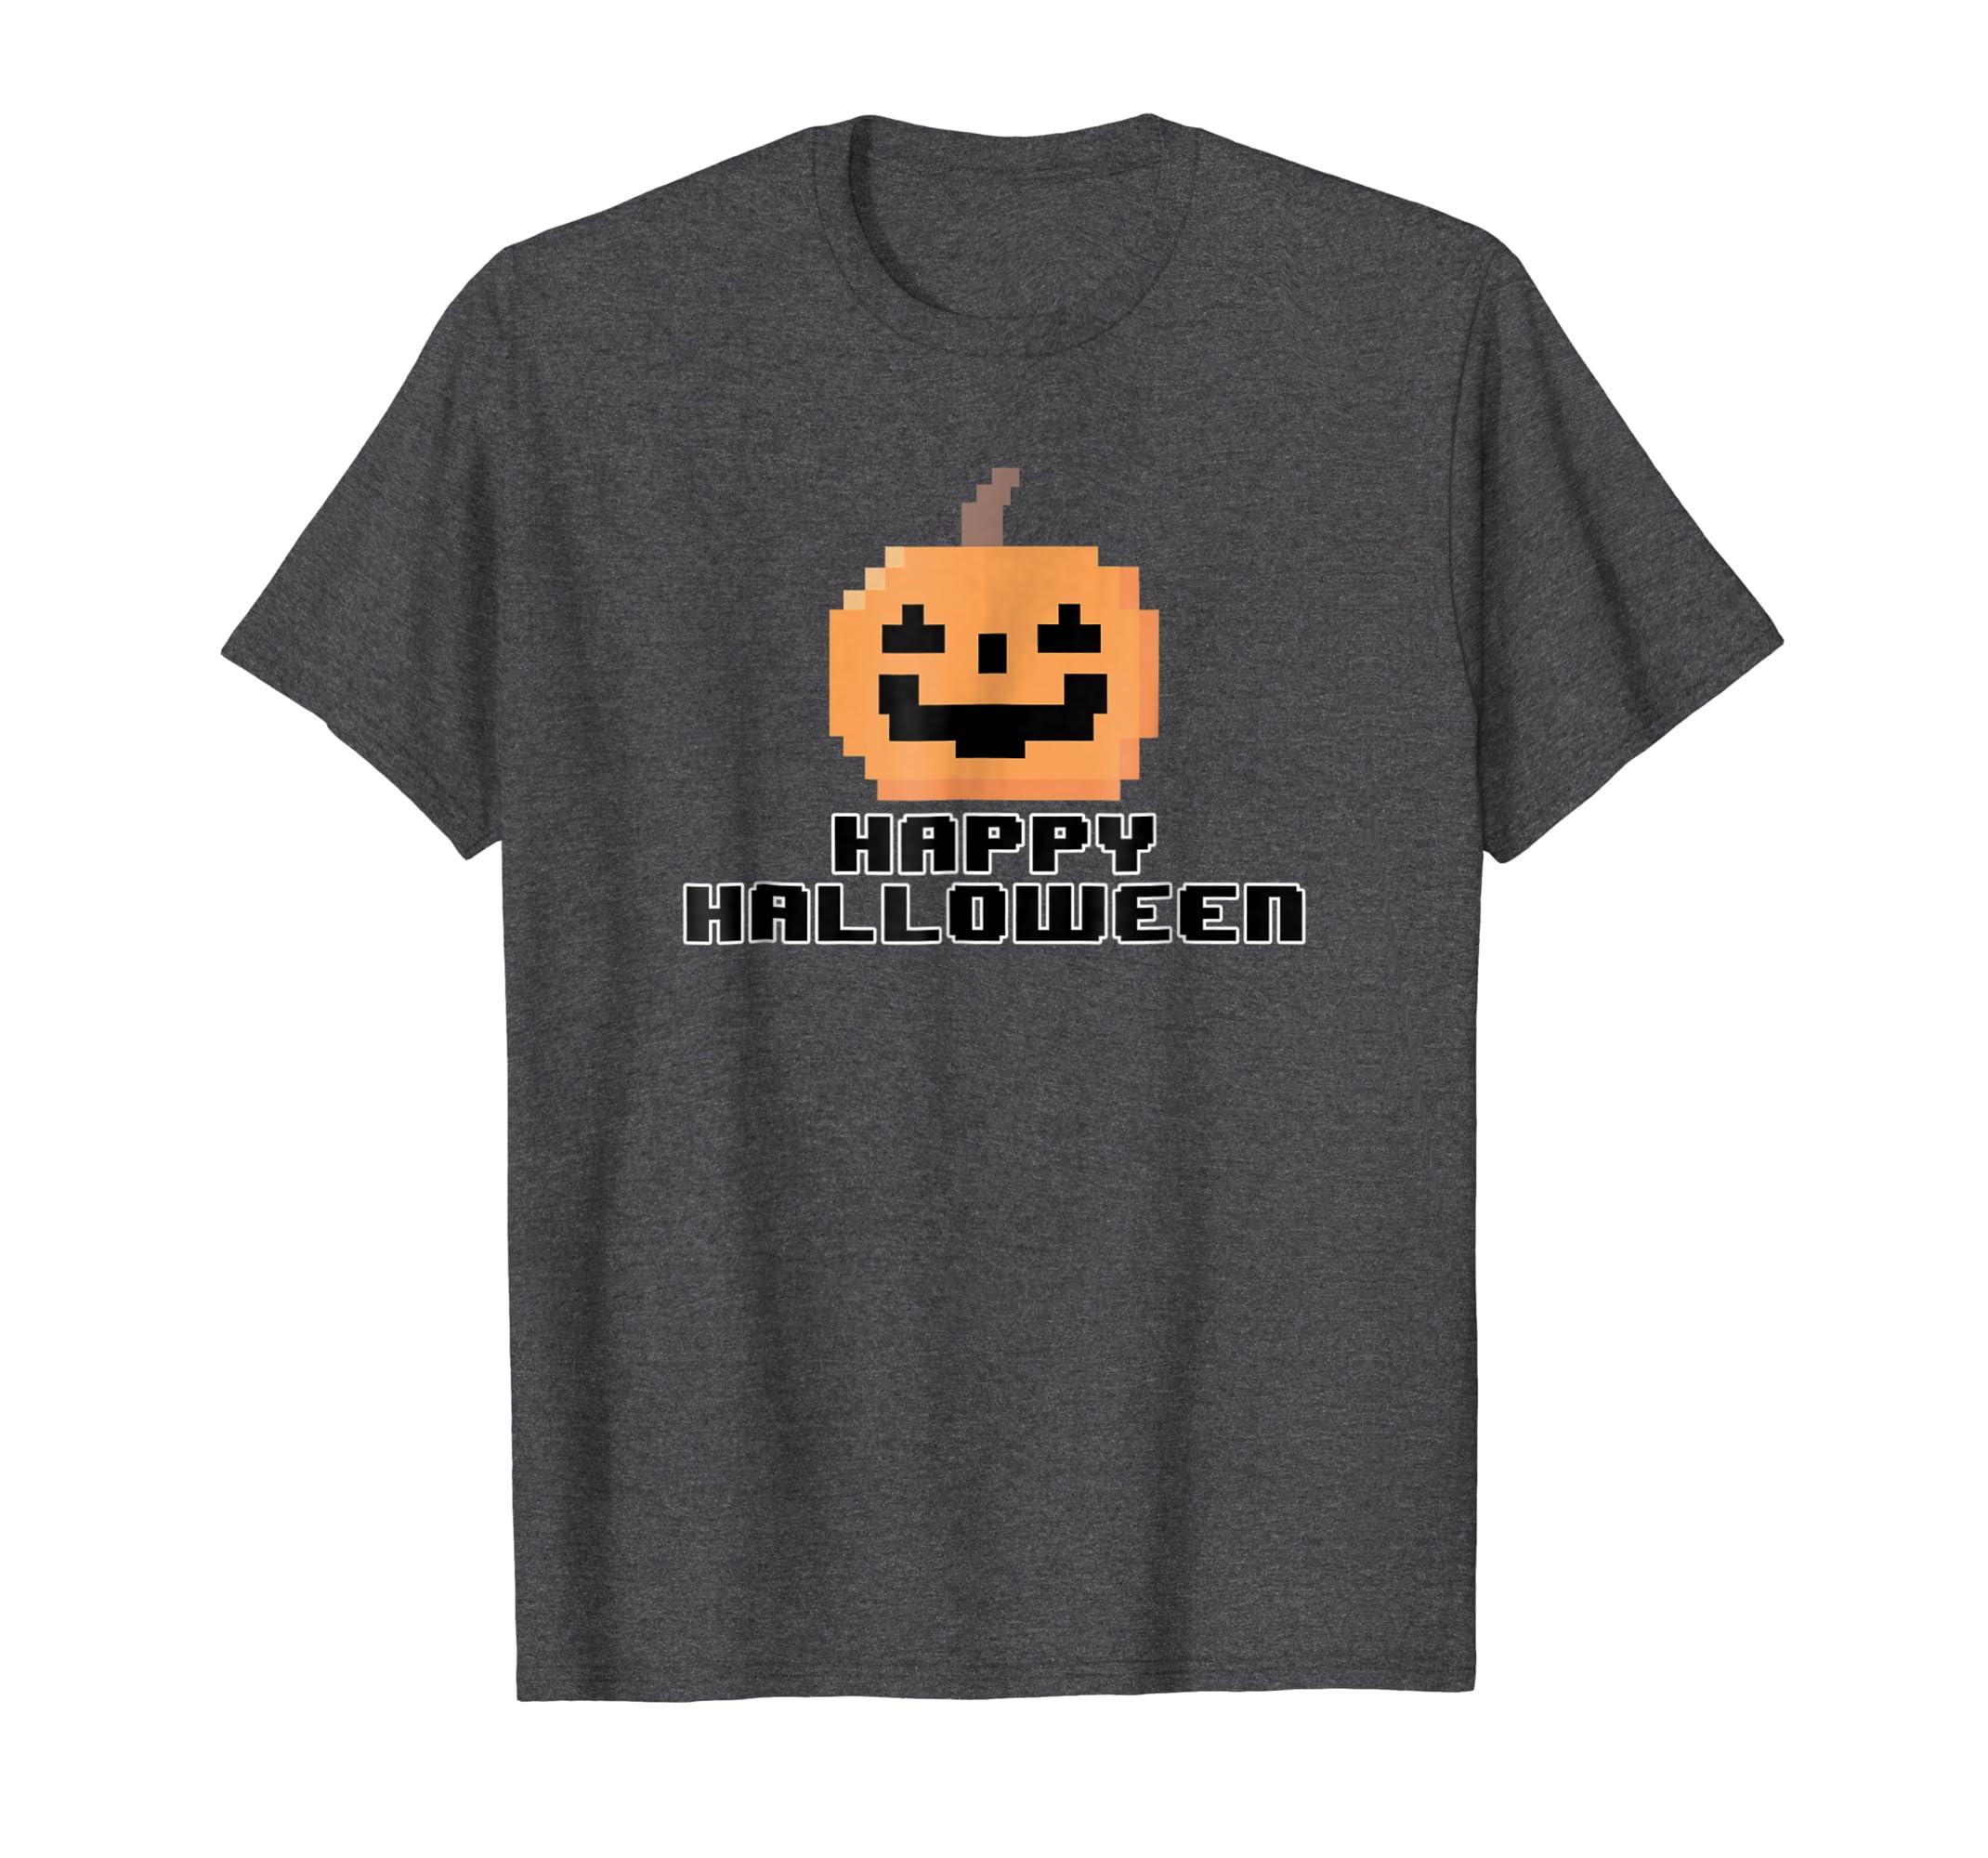 8-bit Classic Arcade Style Large Happy Halloween Pumpkin T-Rose